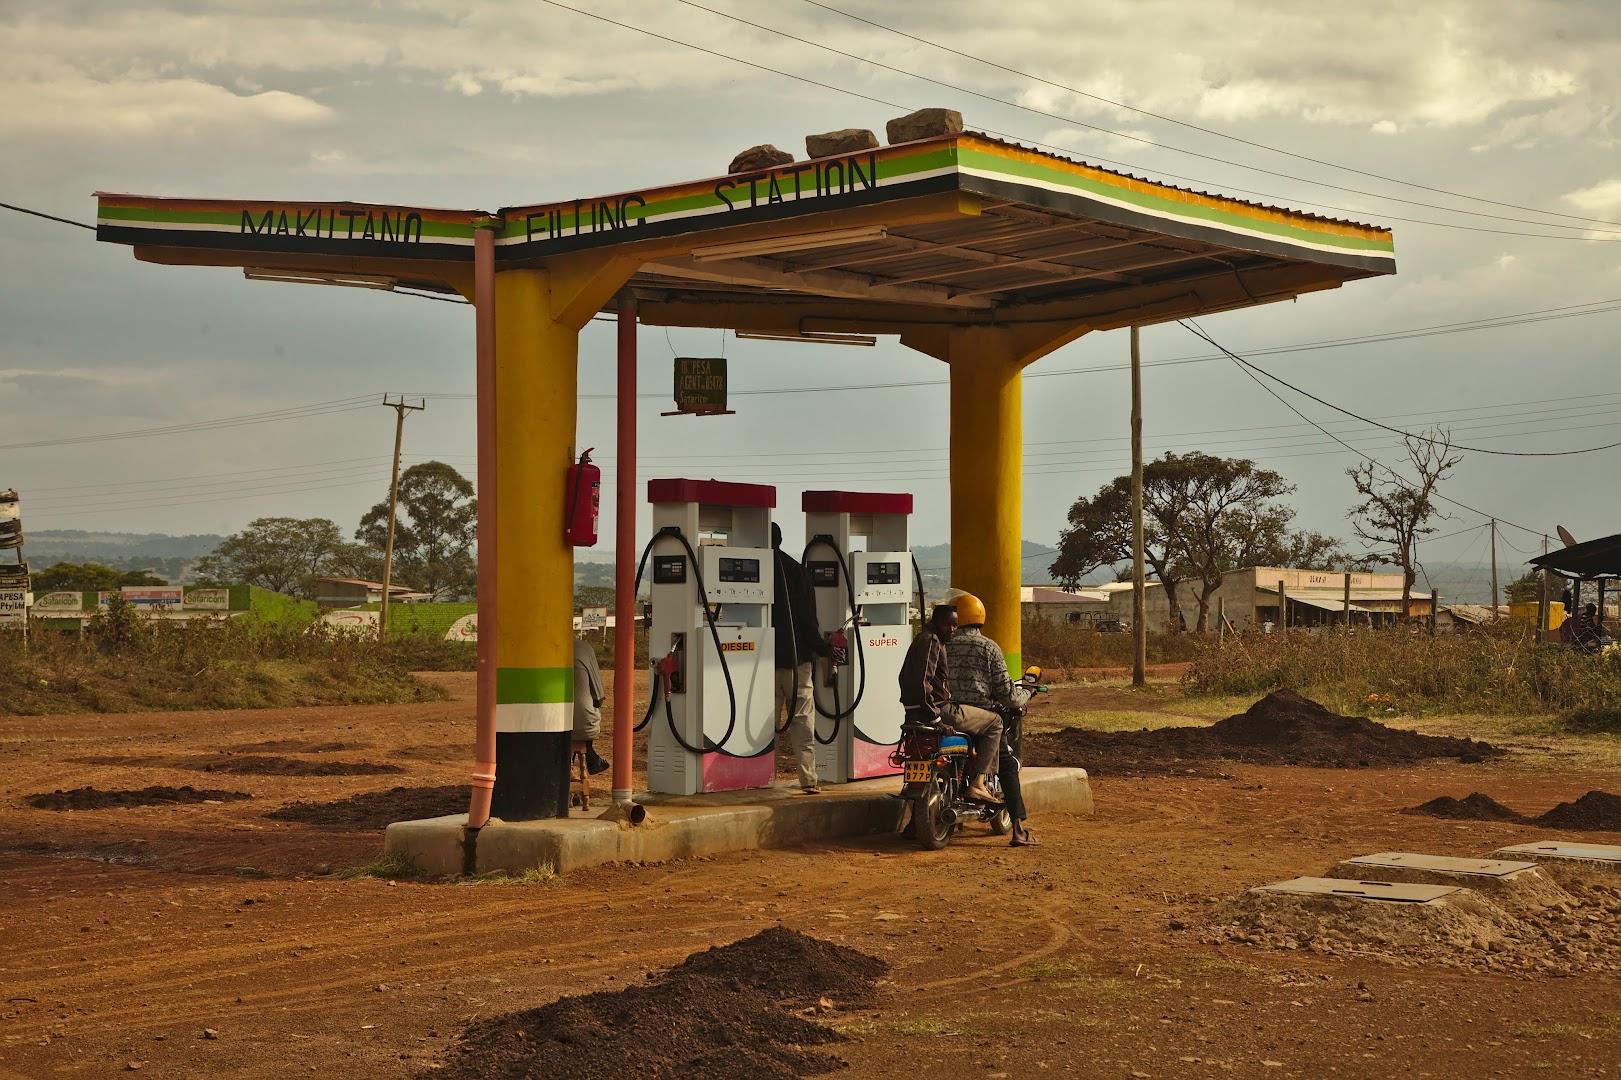 A civilized petrol station